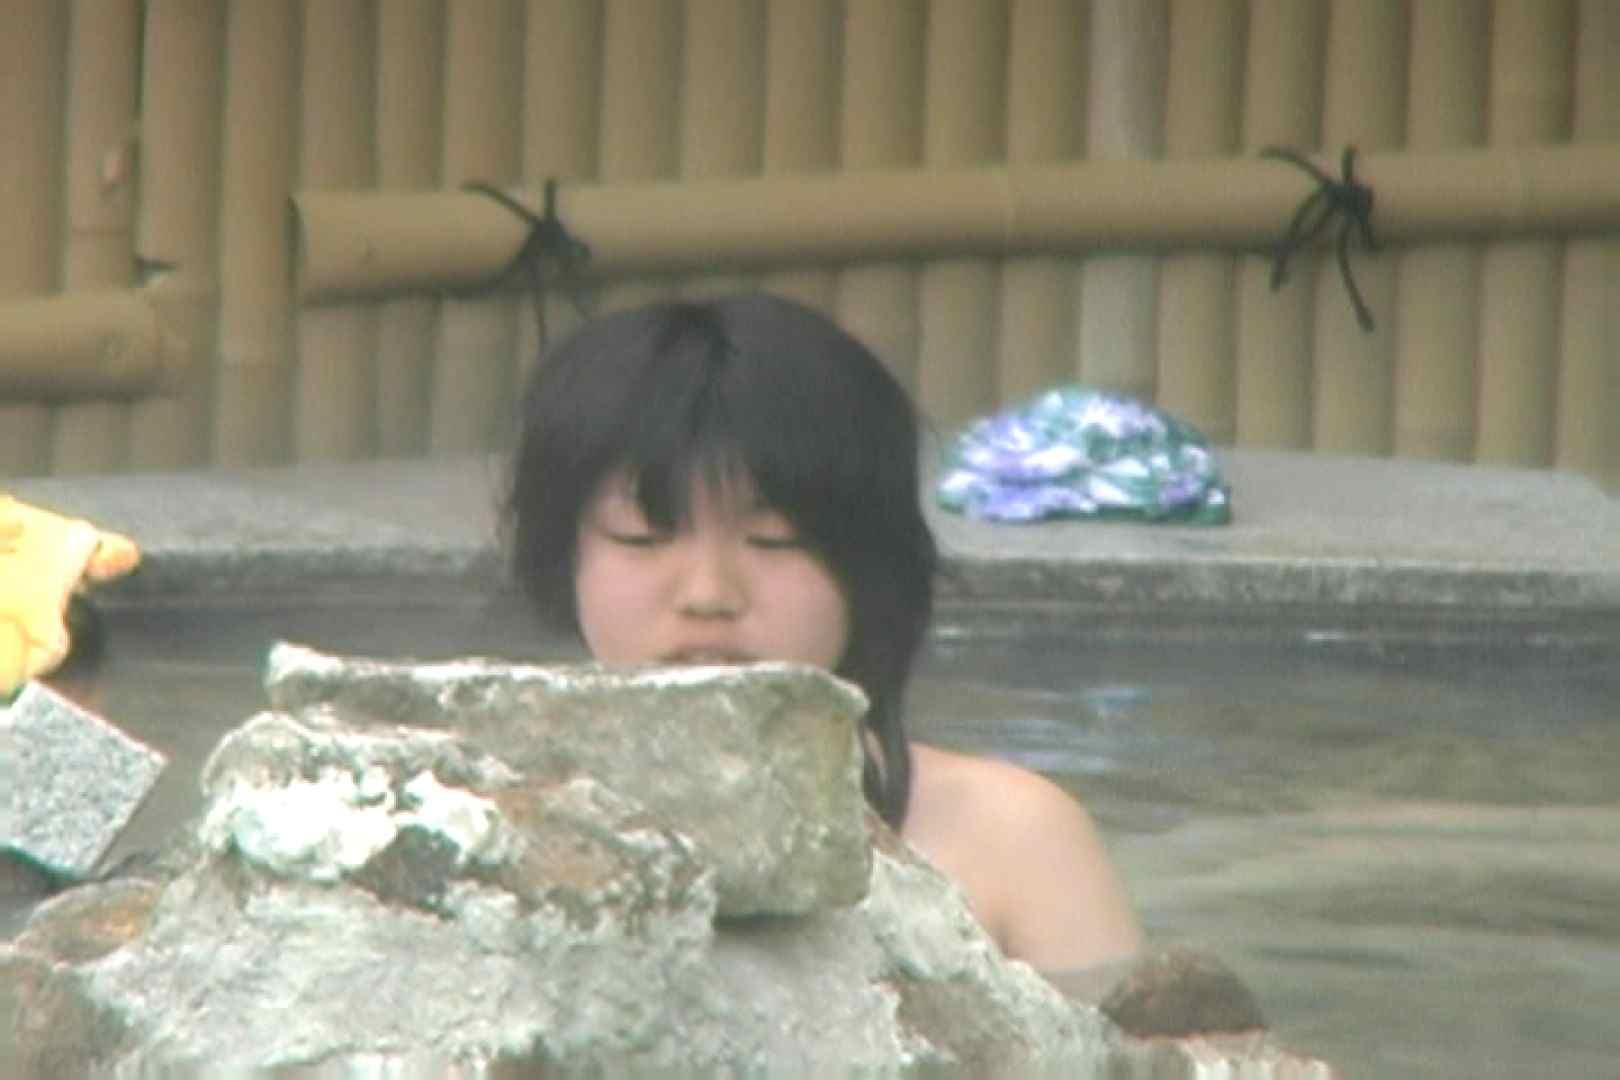 Aquaな露天風呂Vol.566 盗撮 オマンコ無修正動画無料 75枚 35